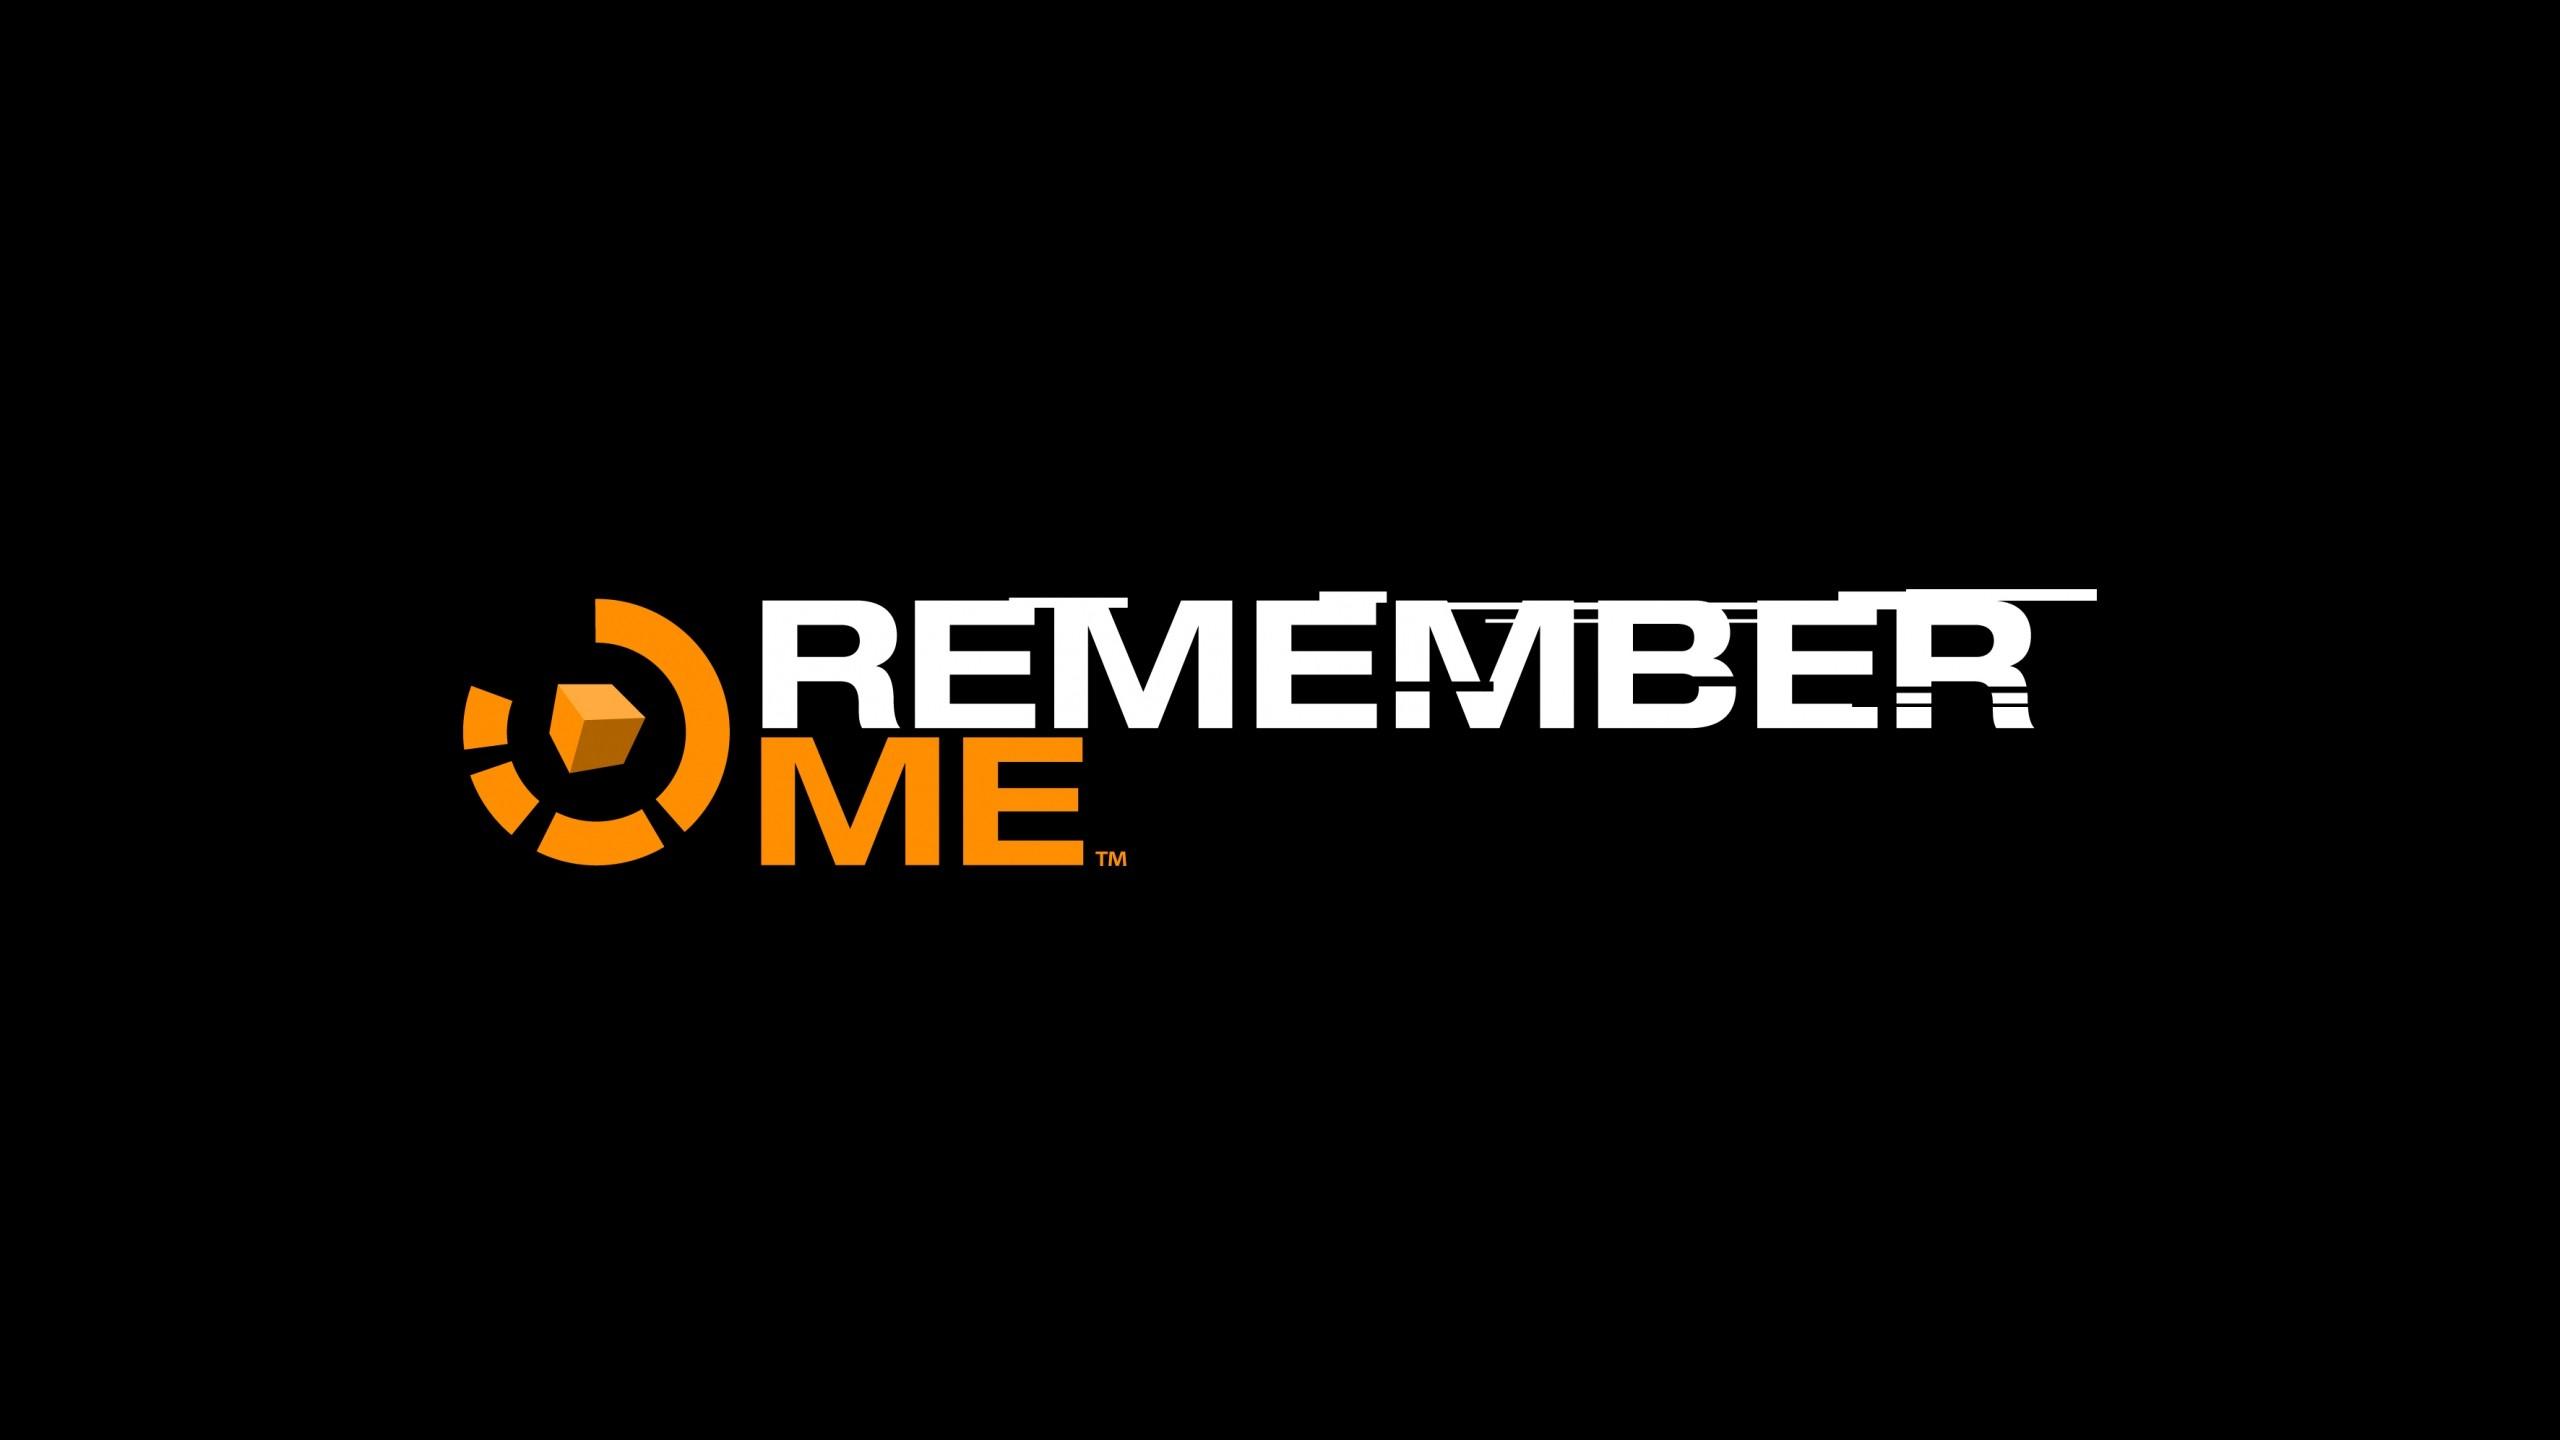 Wallpaper remember me, dontnod entertainment, futuristic game